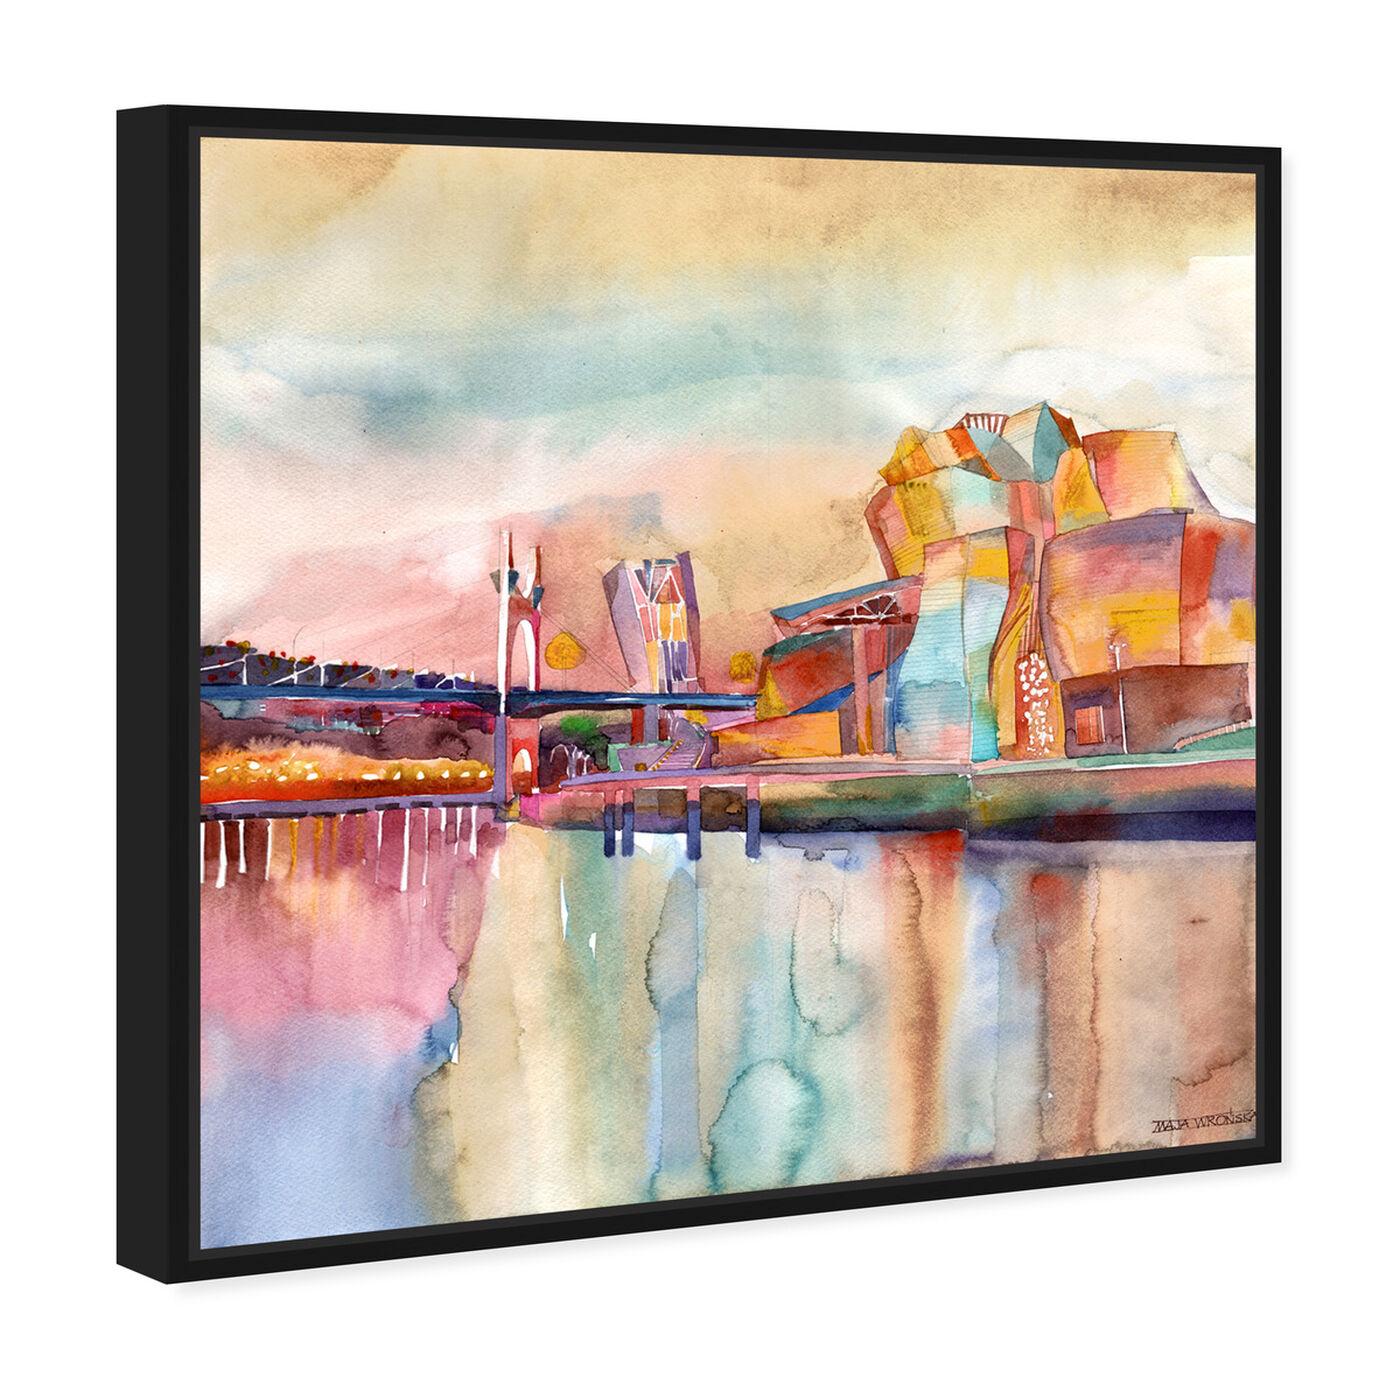 Angled view of Maja Wronska - Bilbao featuring world and countries and european countries art.